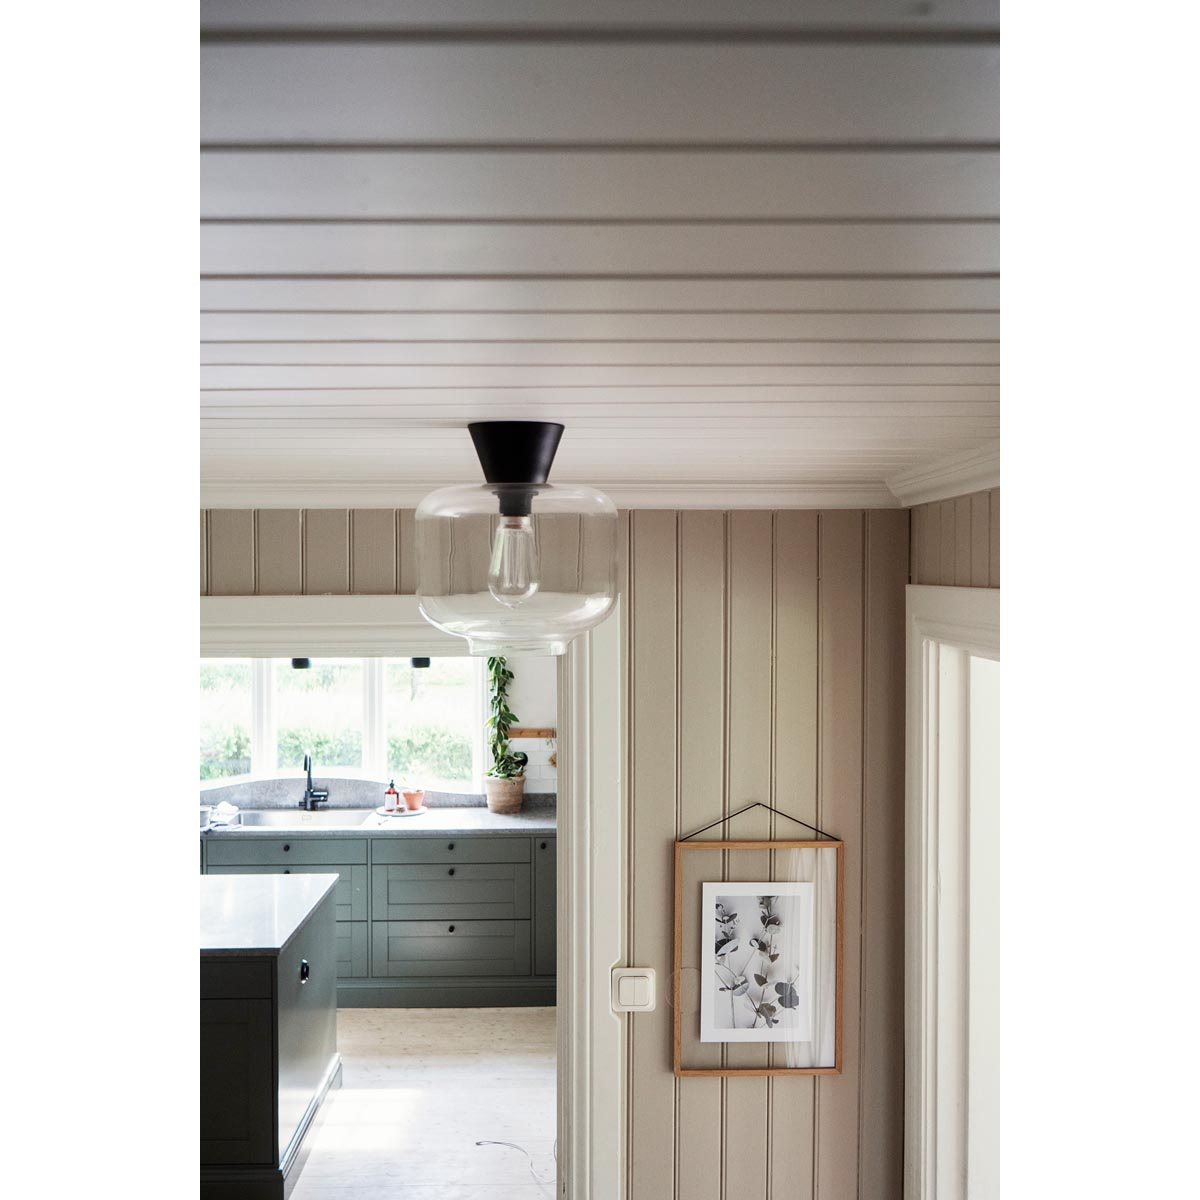 Ritz-plafond-klar-svart-miljo-663555_1